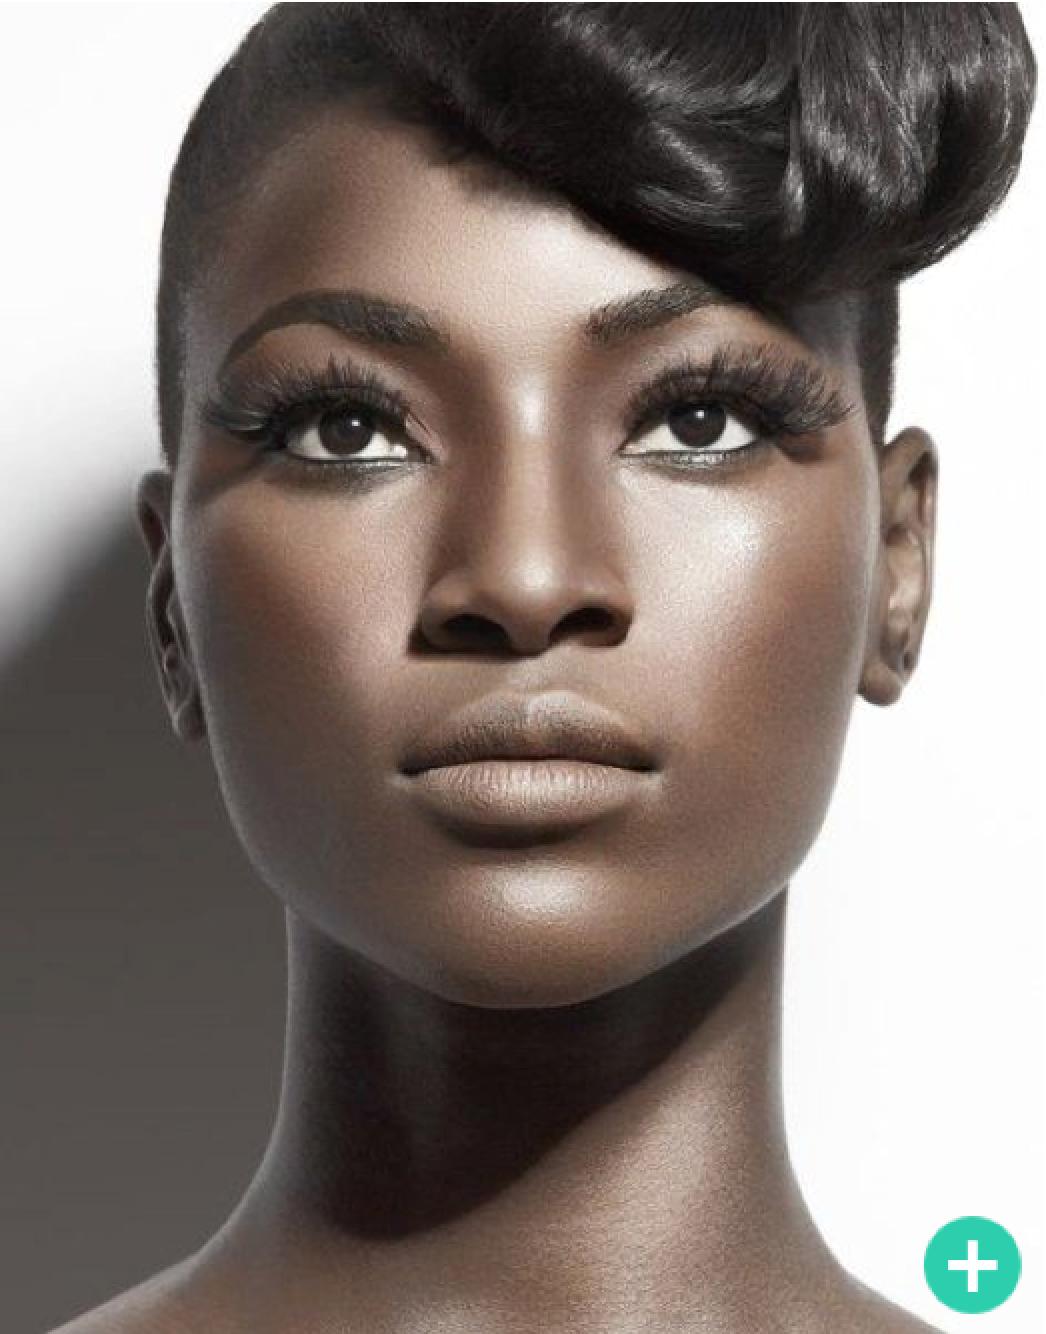 SHINE Basic elements for a perfect shine #DoBundle #skin #skincare #makeup #beauty